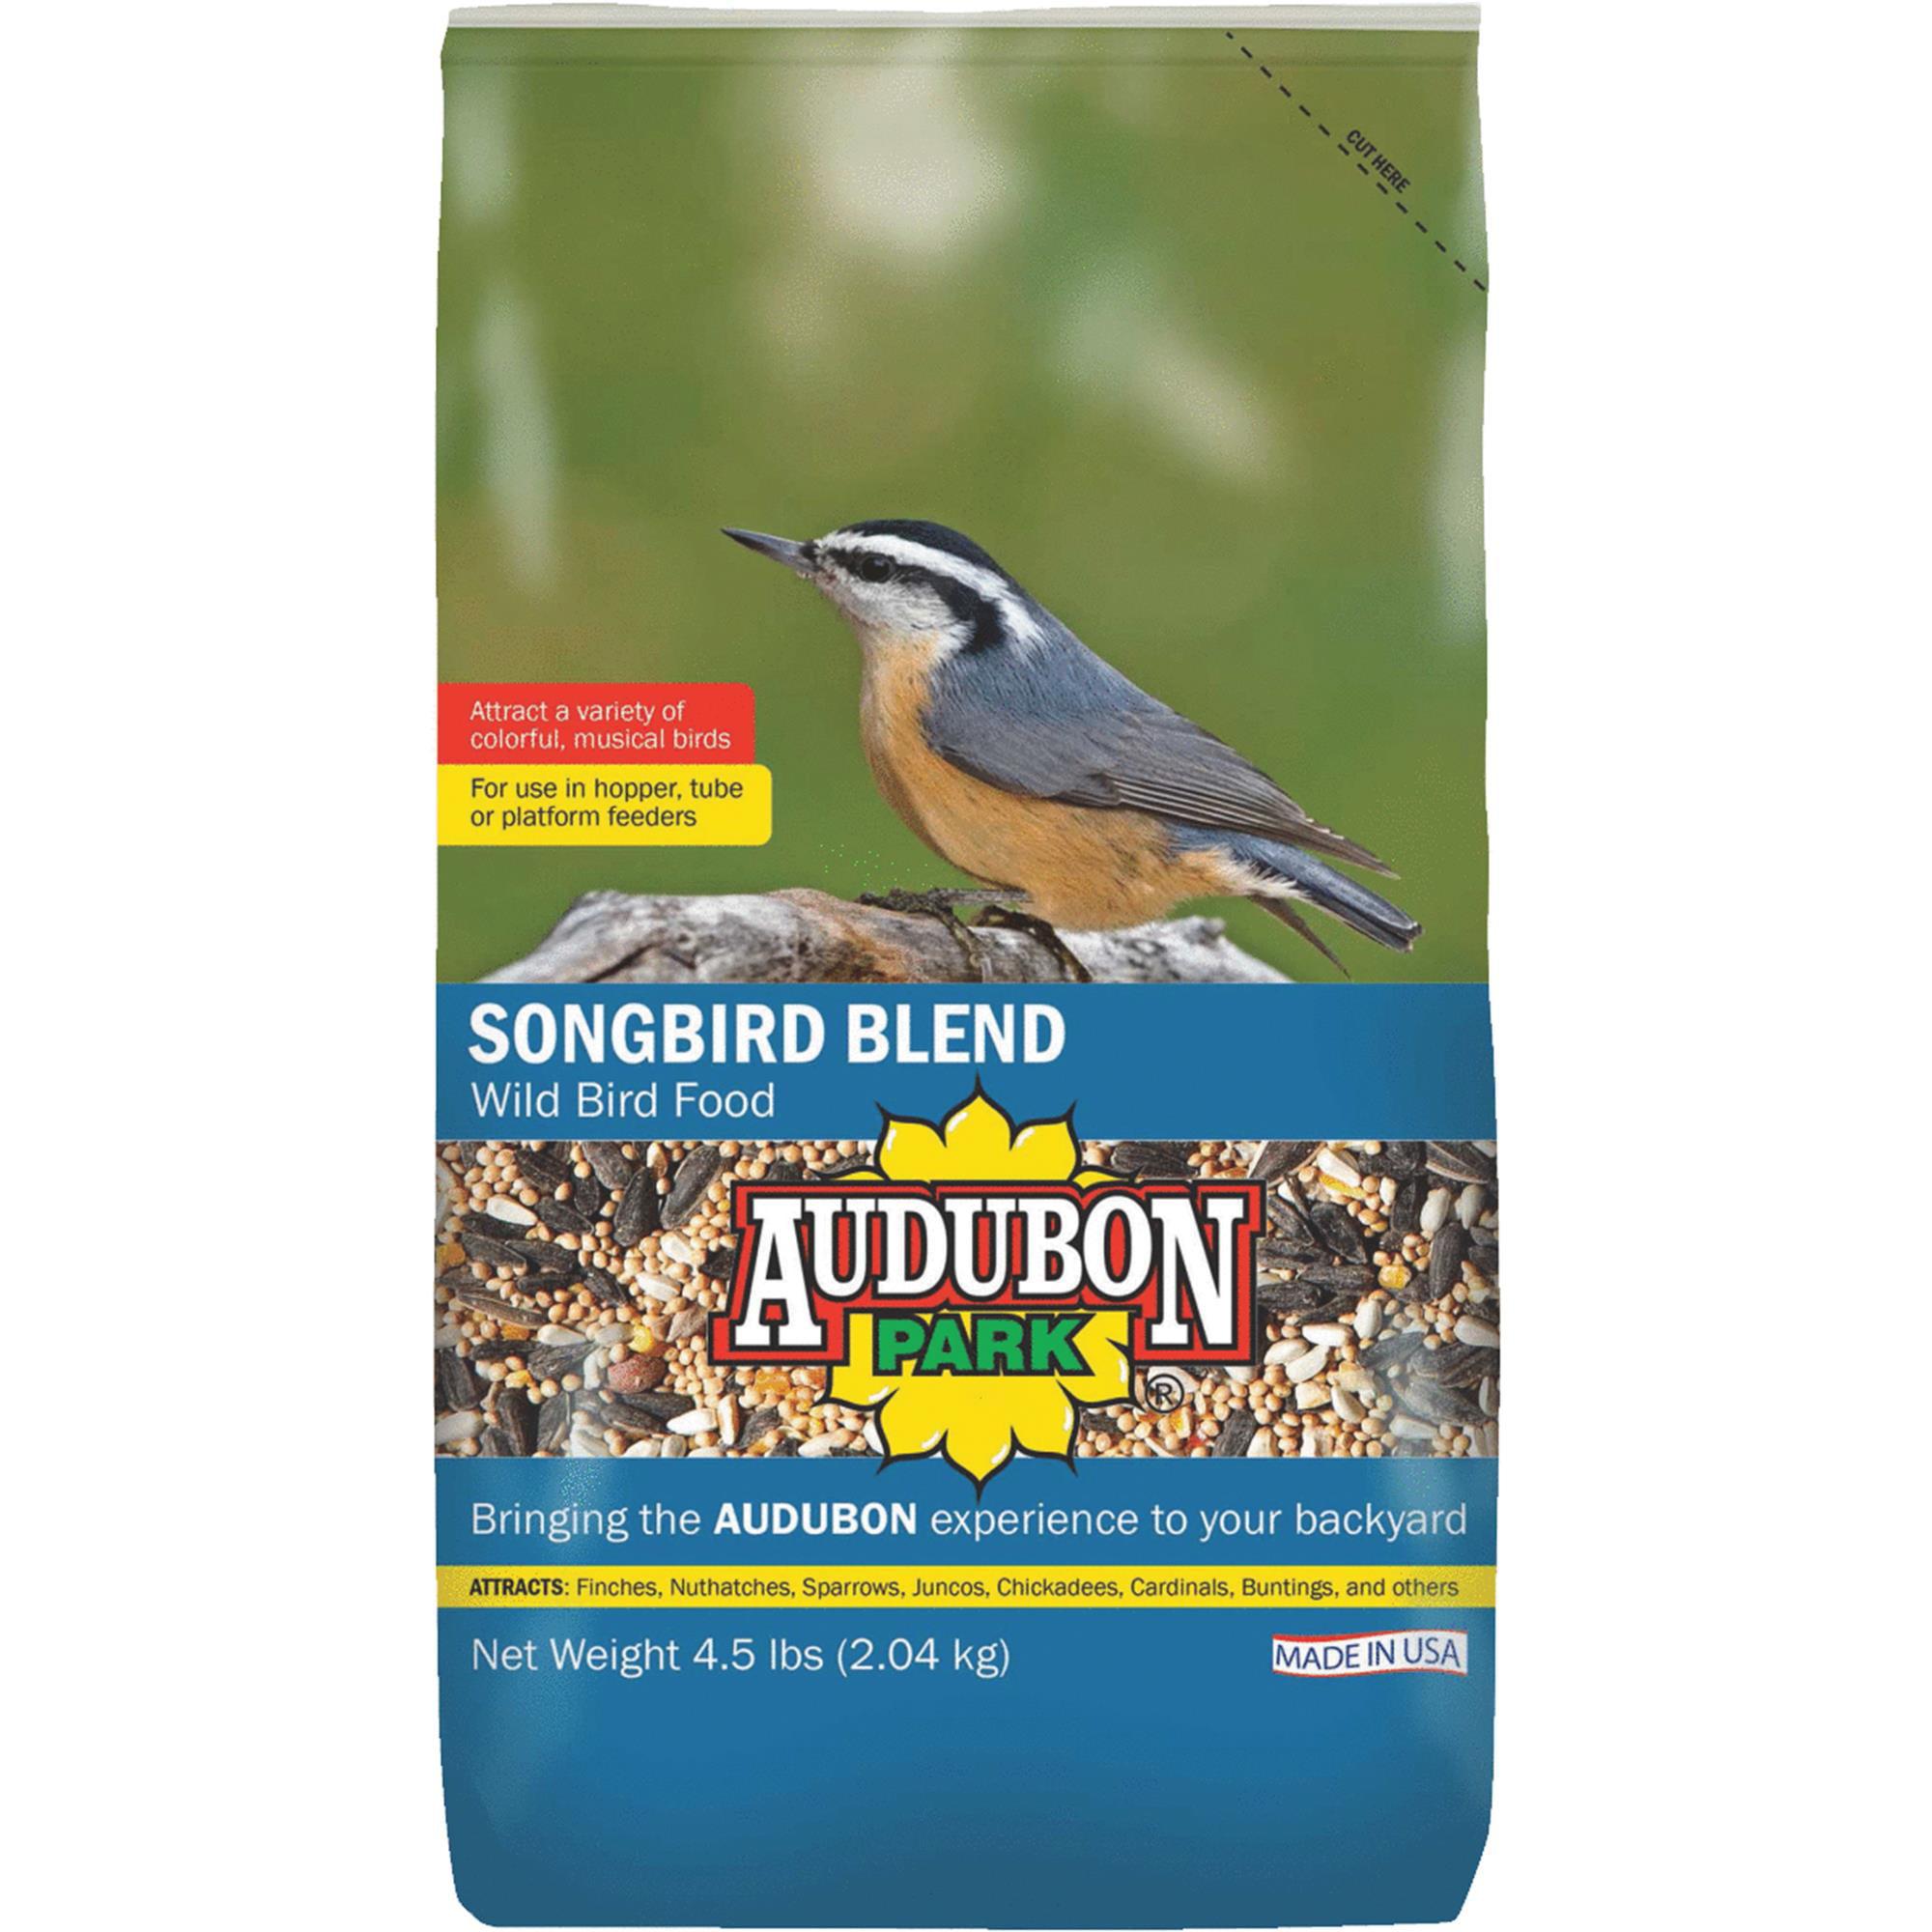 Audubon Park 10777 4.5 lb Songbird Wild Bird Food by Global Harvest/woodinville